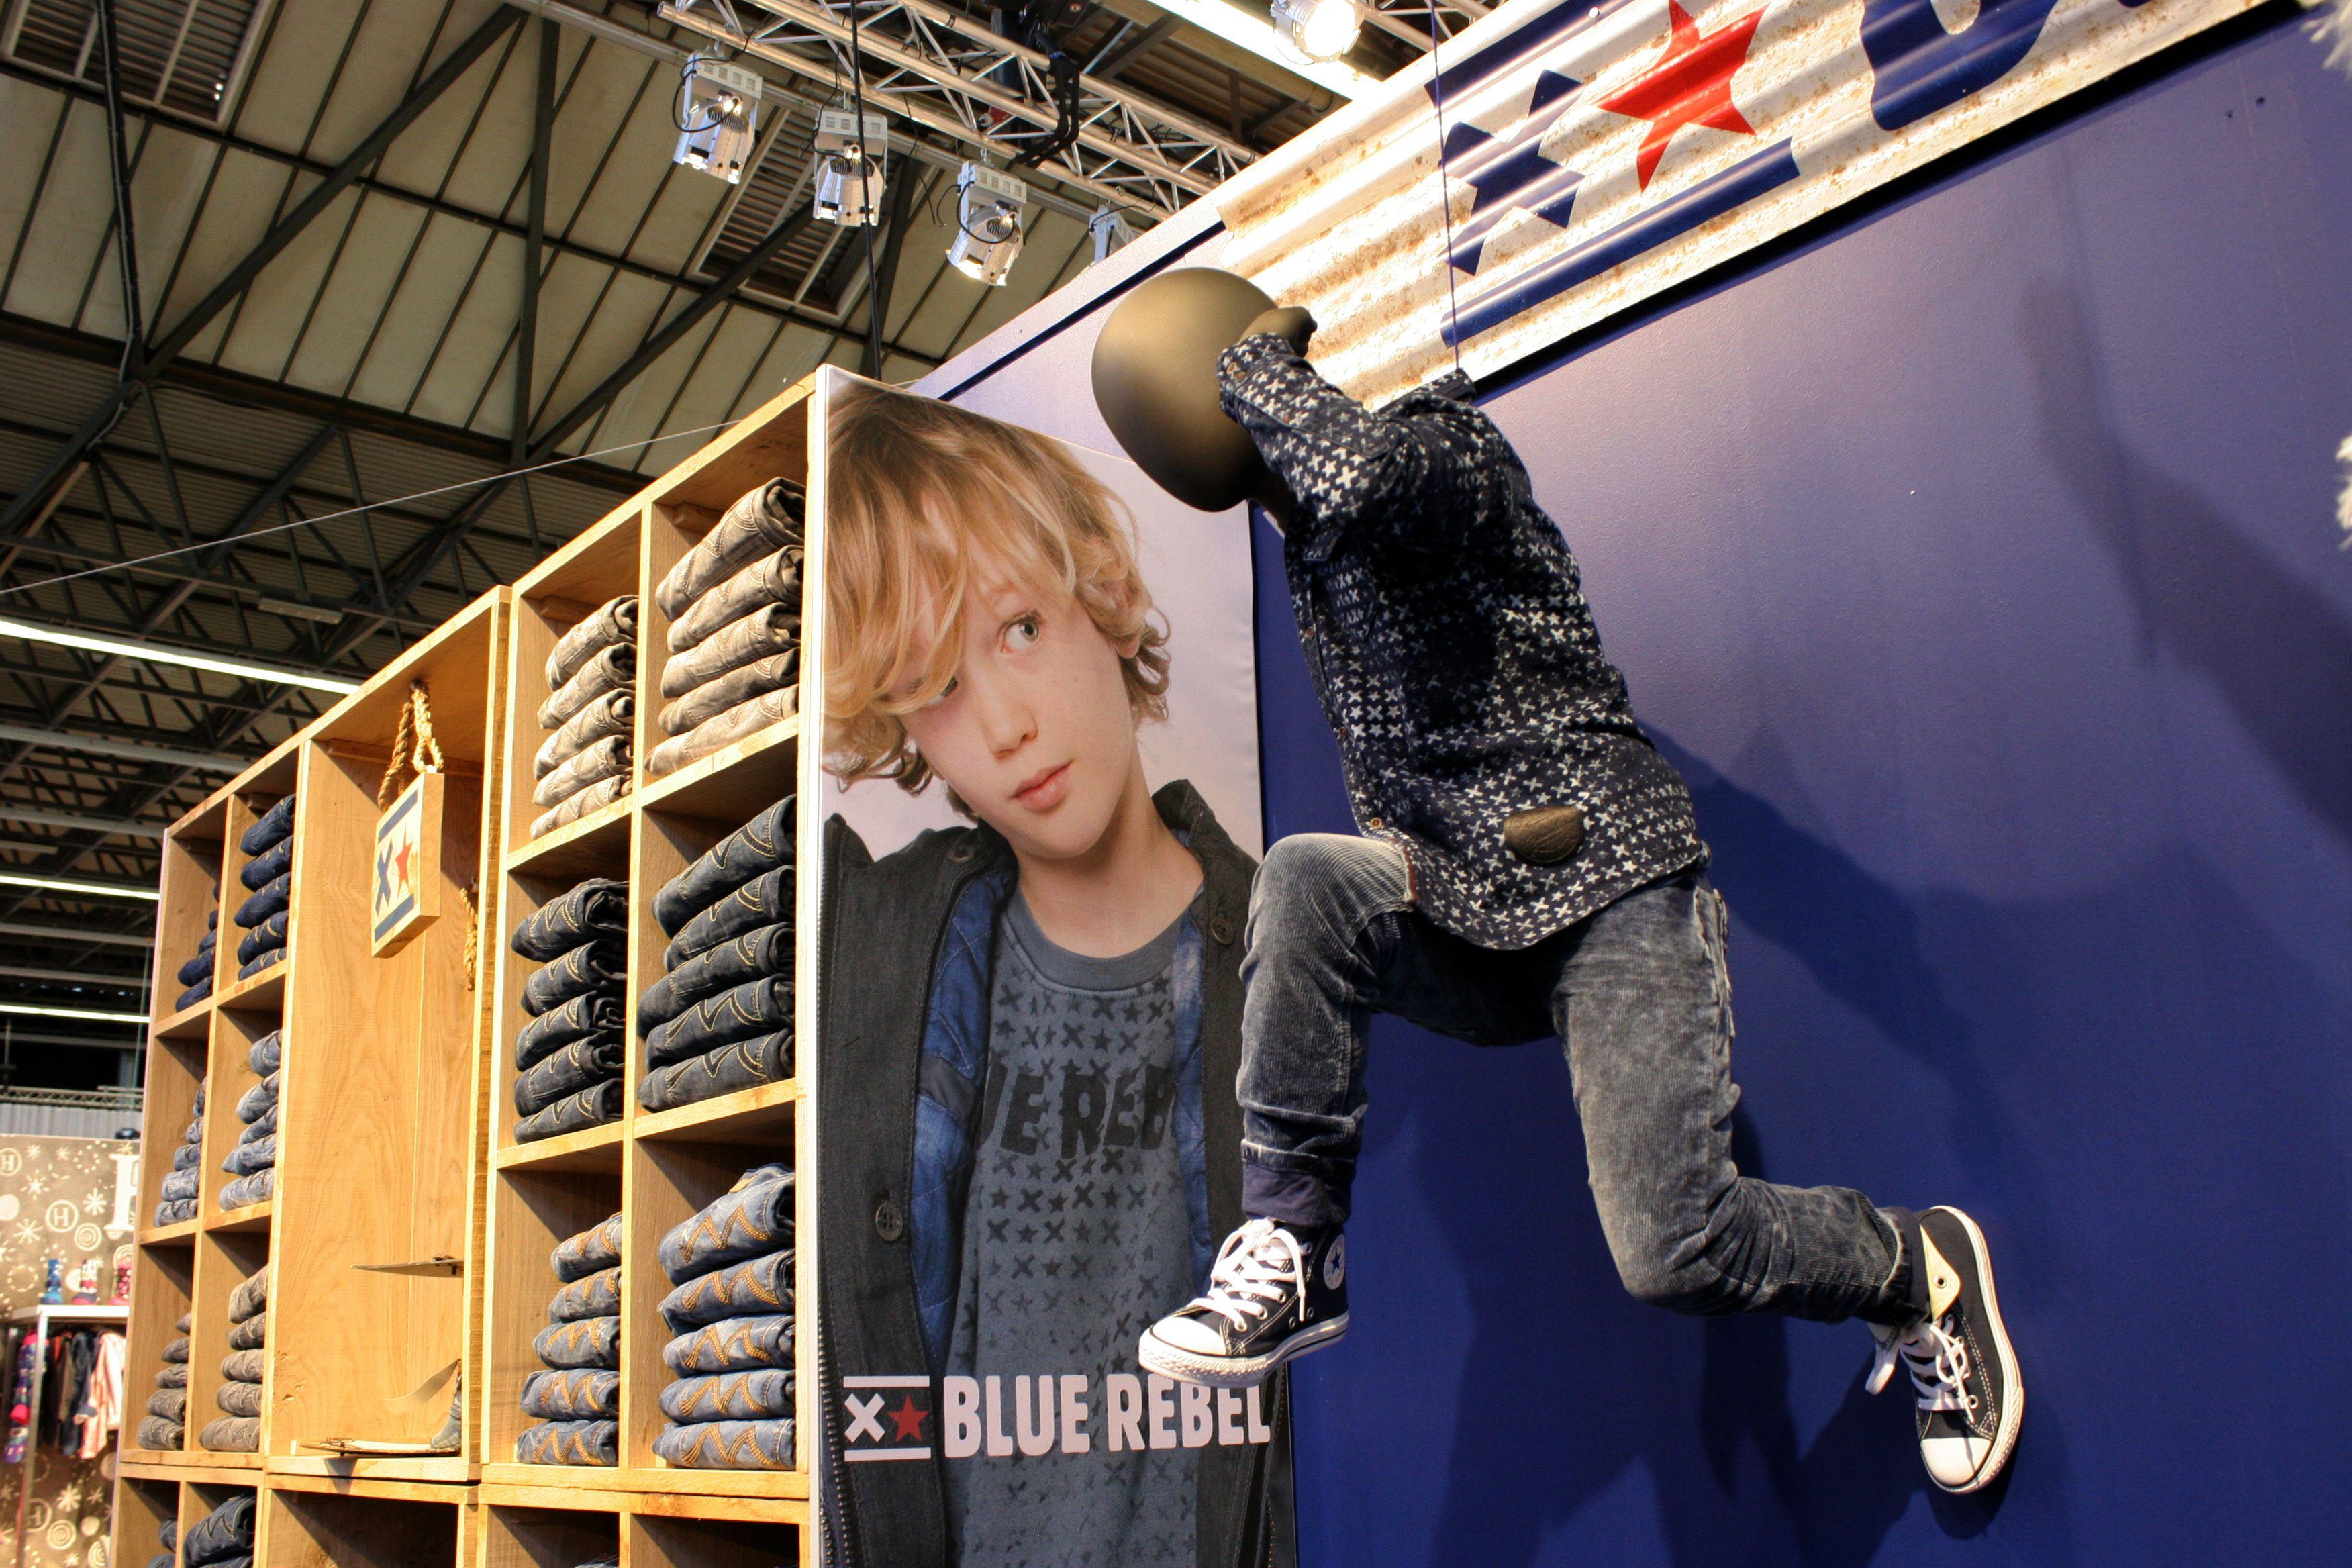 Blue Rebel @ kleine fabriek Amsterdam